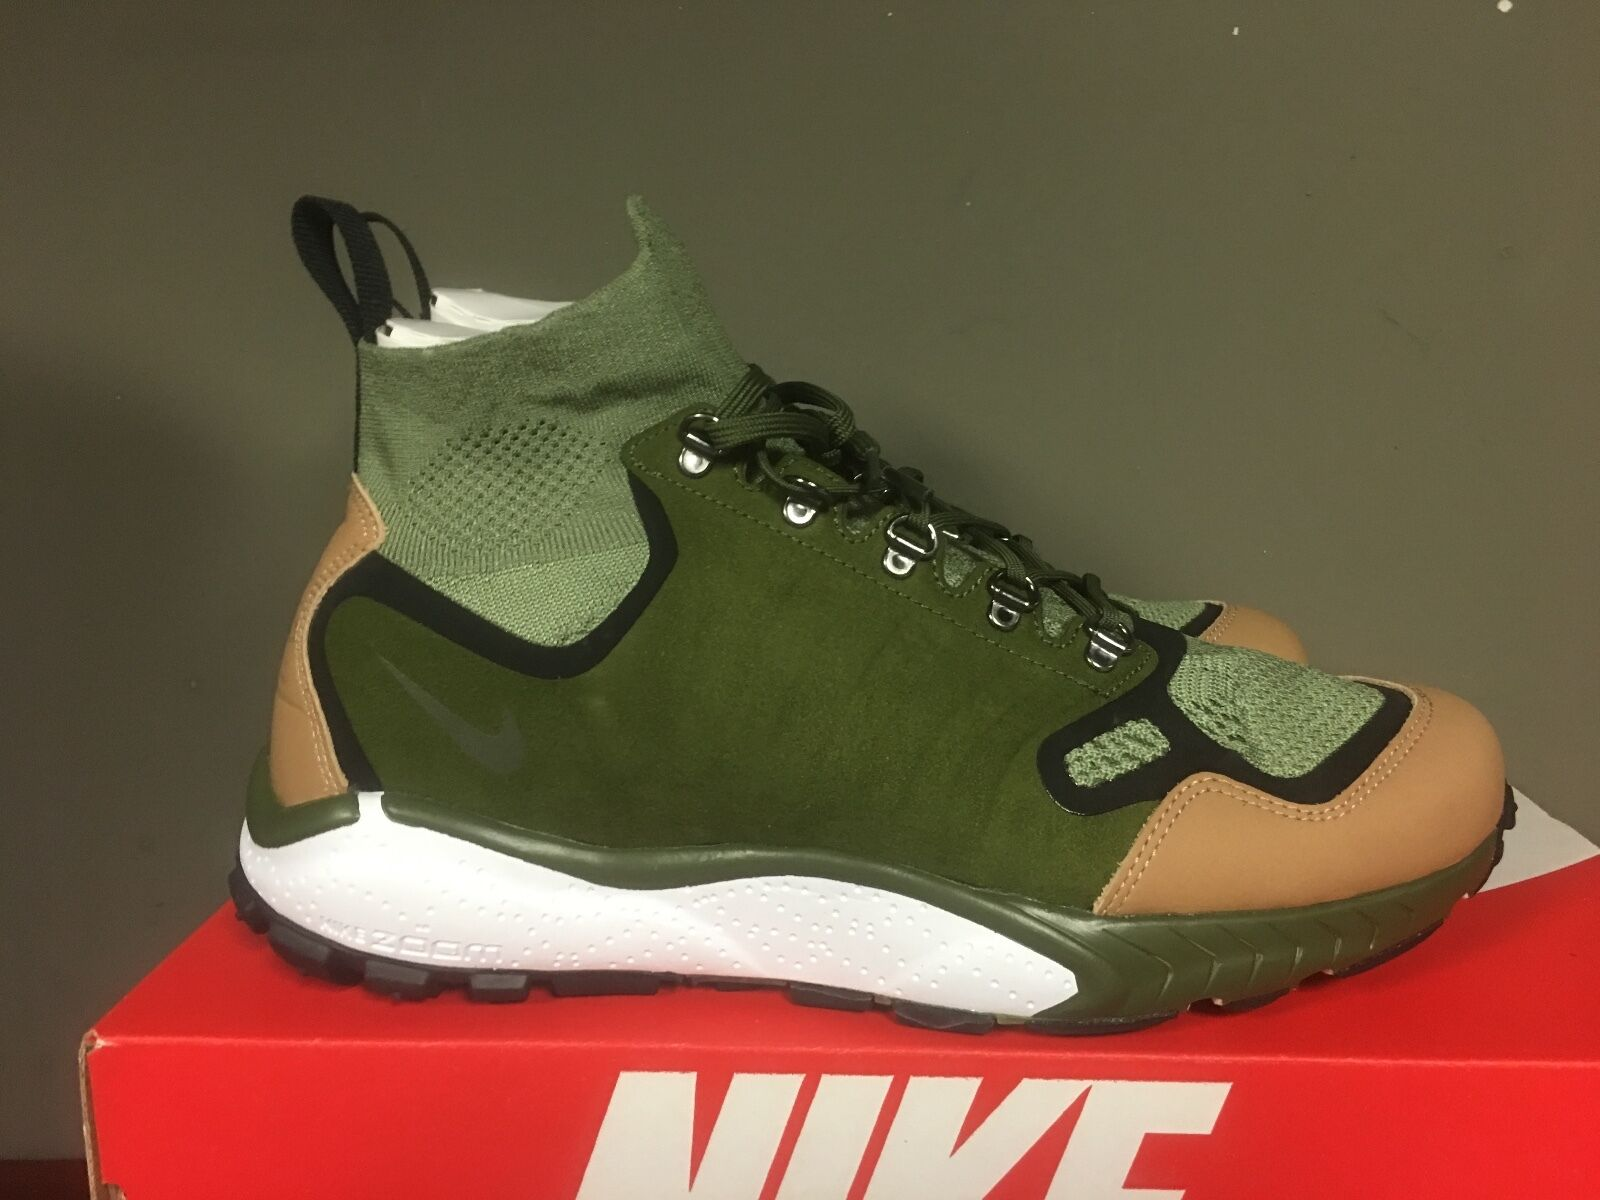 Nike air zoom talaria metà gamba flyknit palm green / gamba metà green vachetta tan 875784-300 07d32a